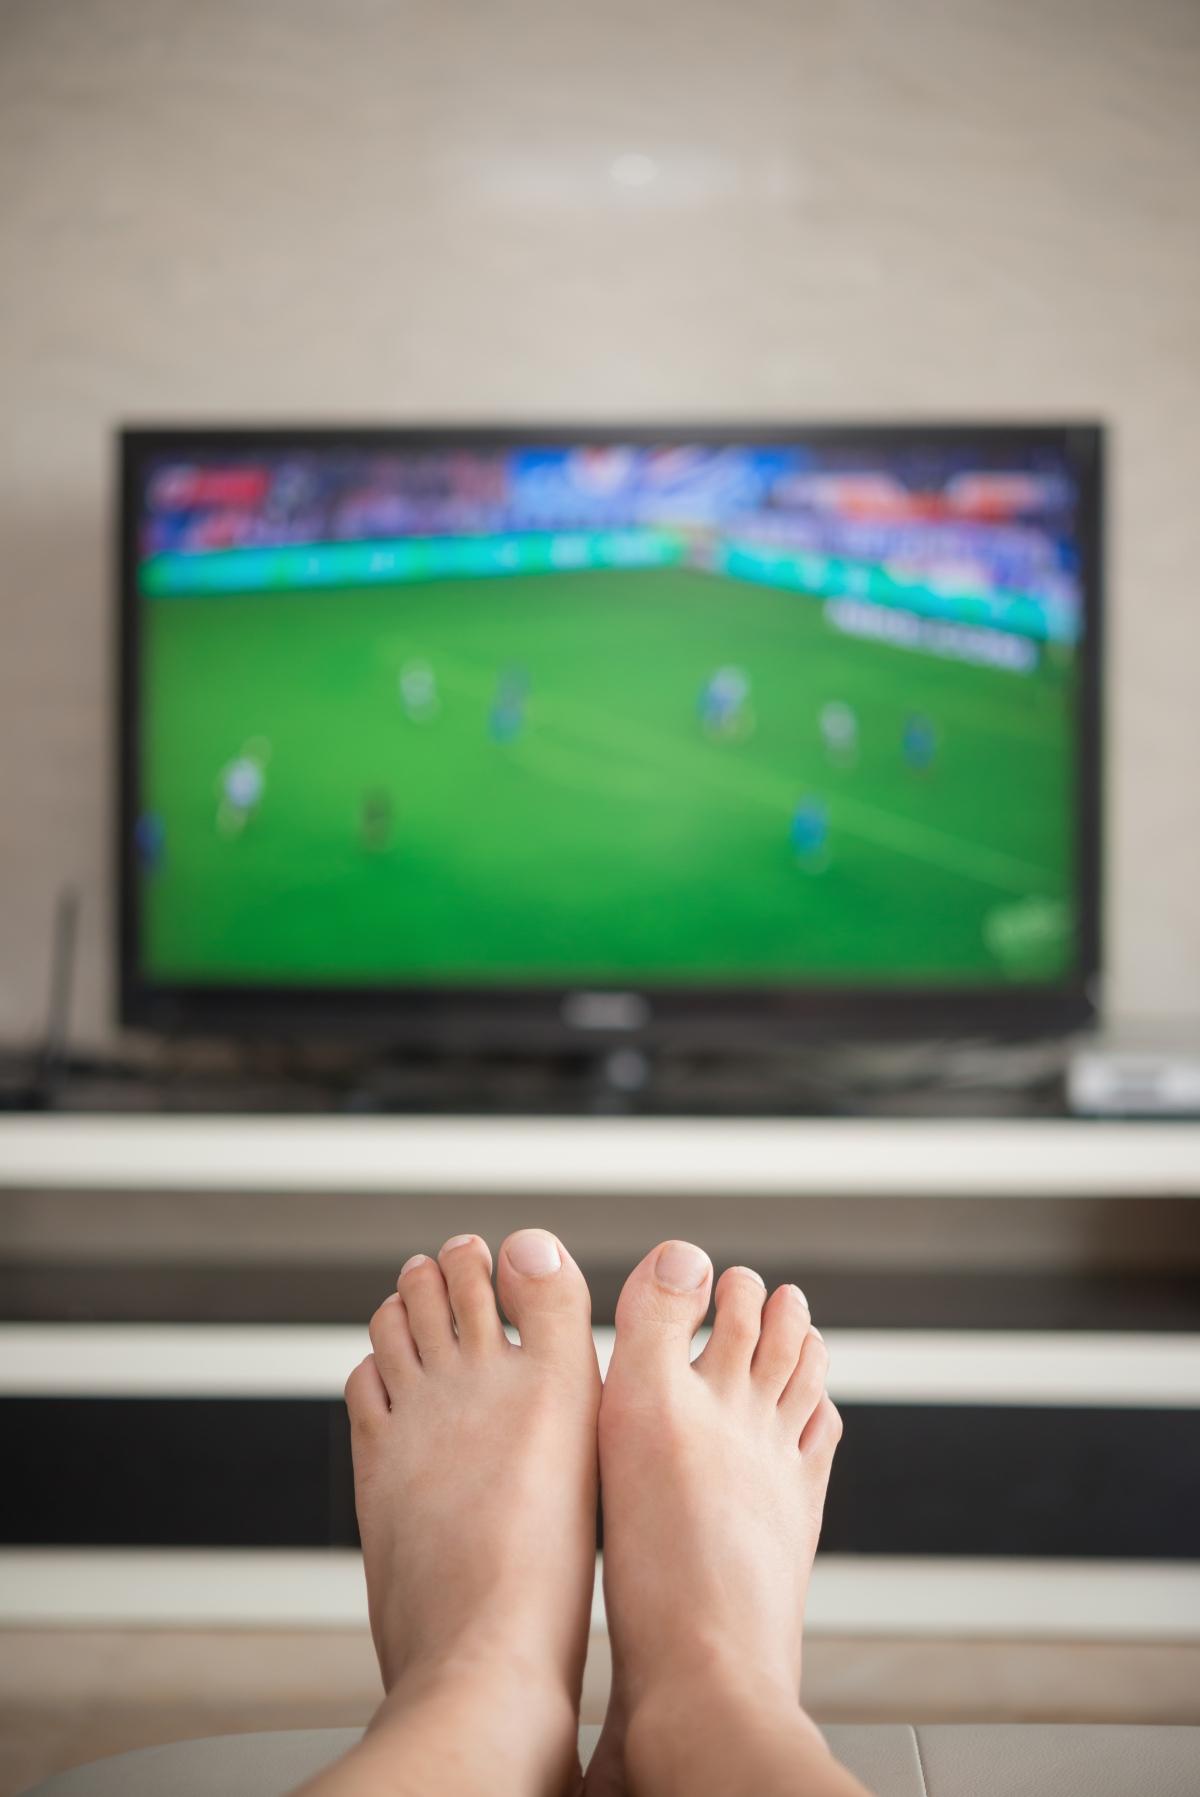 Watching Football